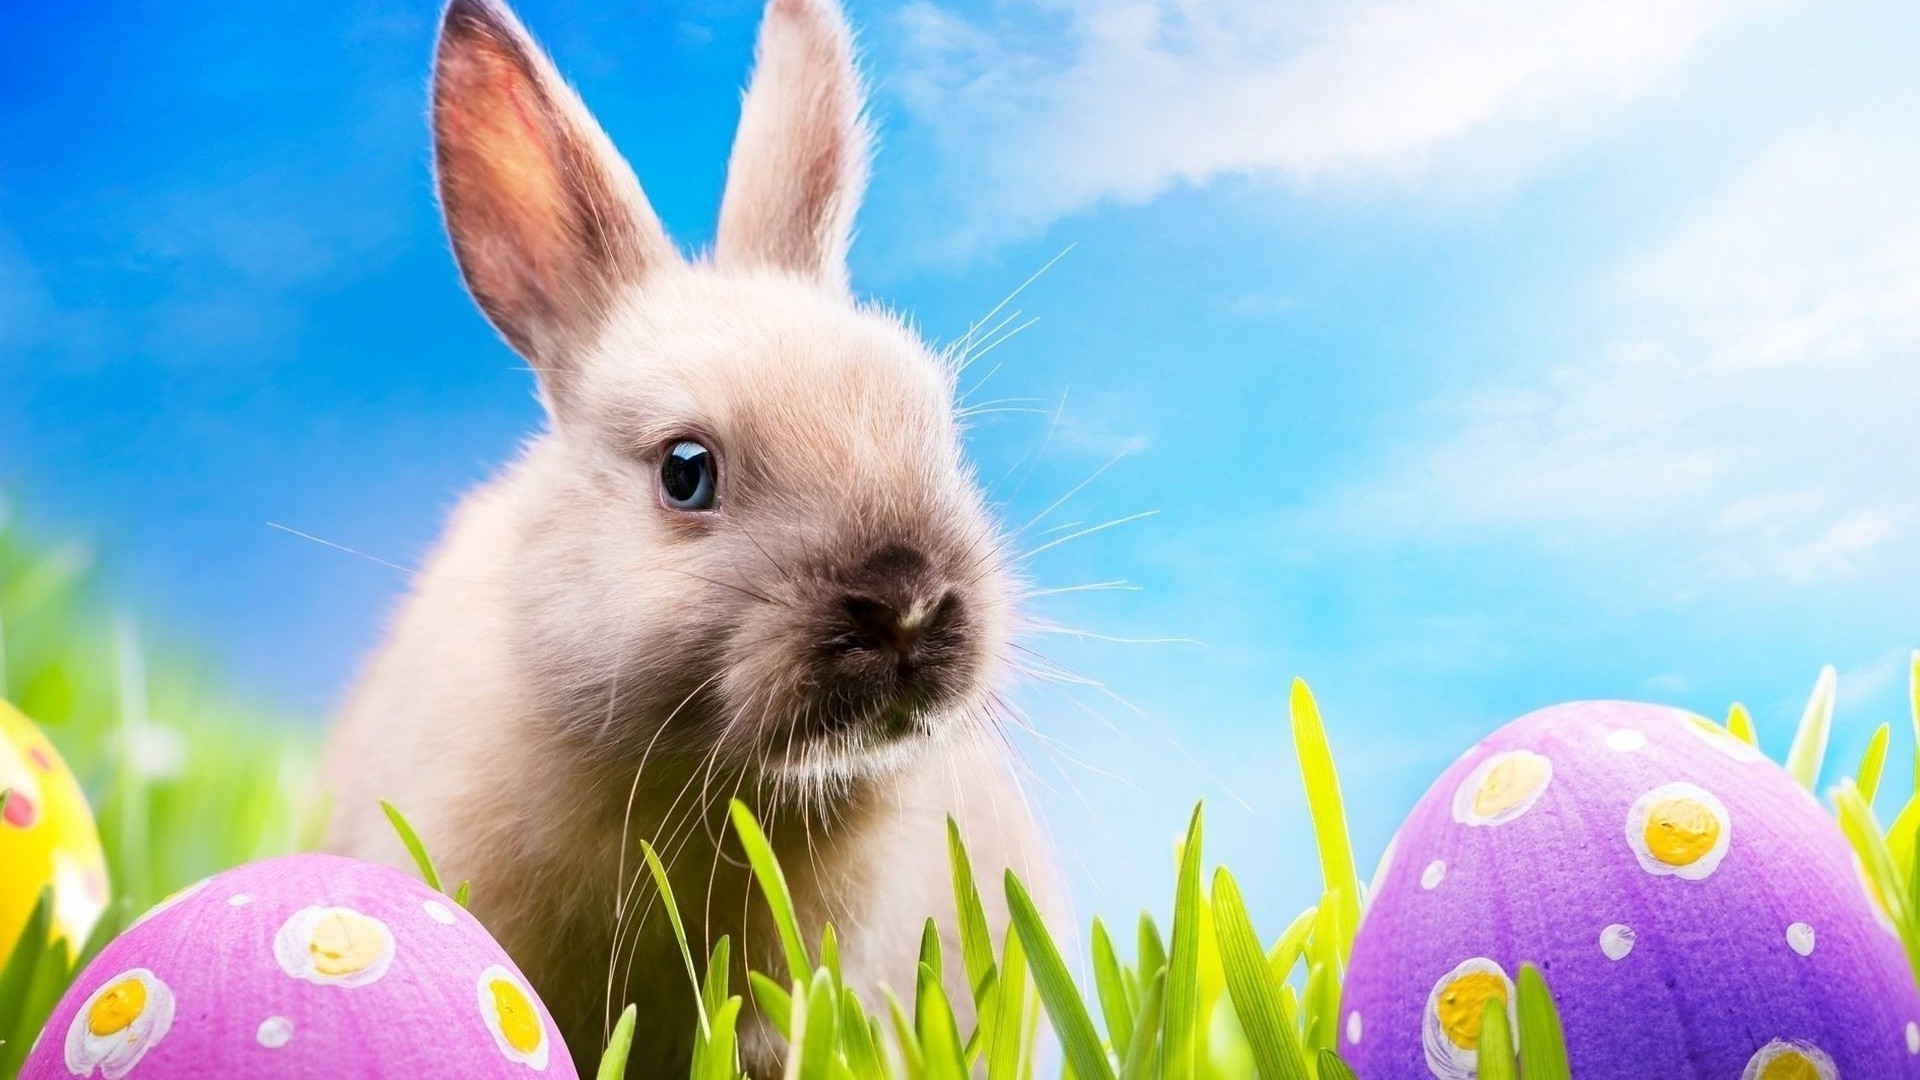 Cute Easter Wallpaper Full HD